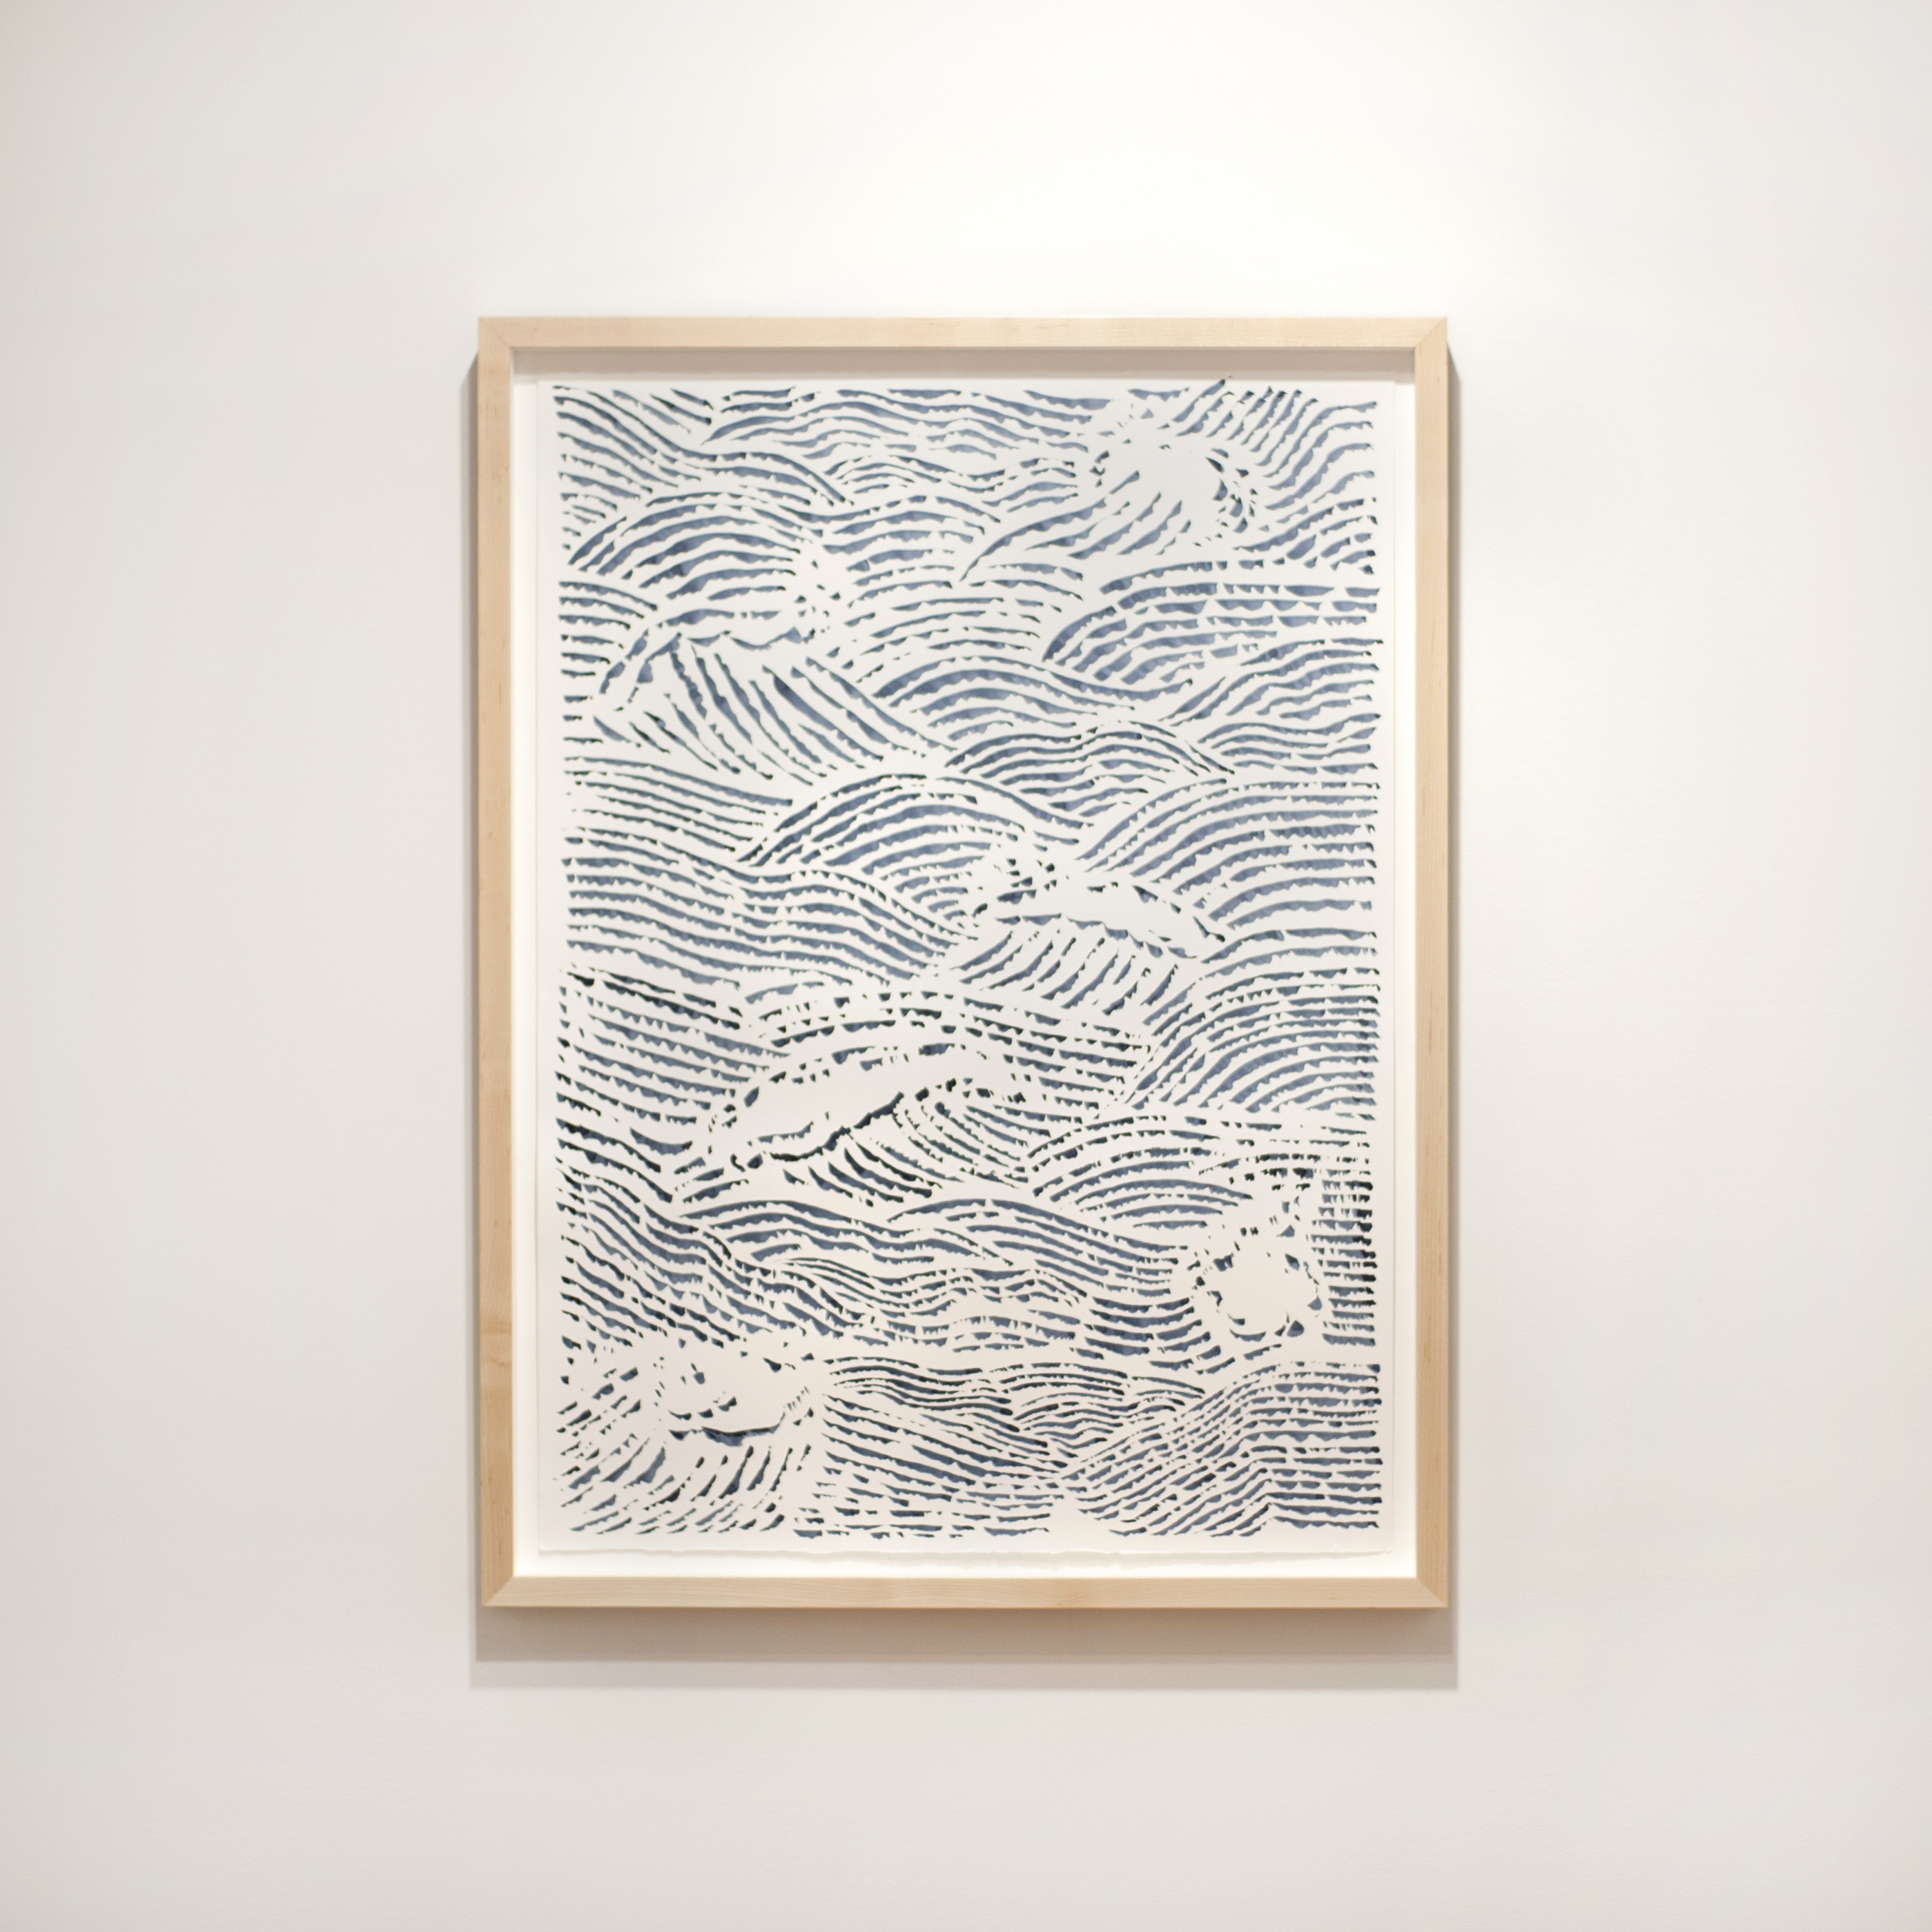 Gallery Space: Louie Crumbley